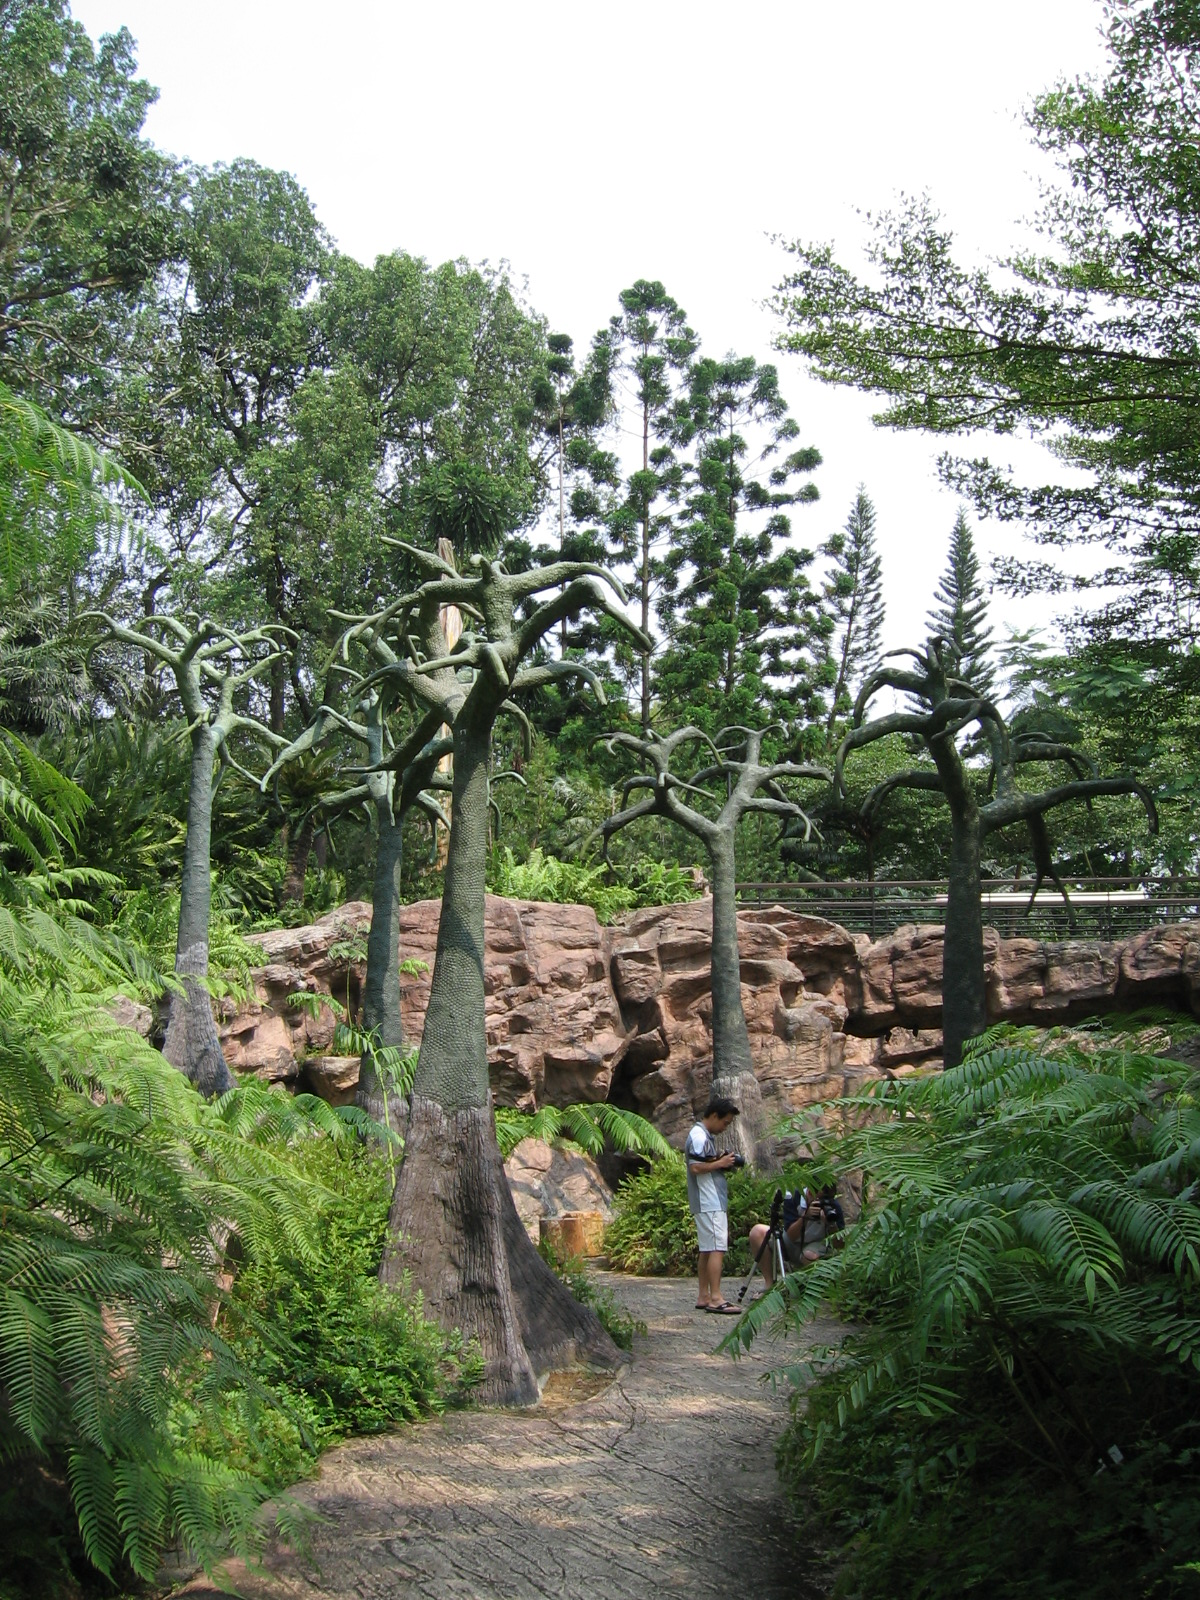 Evolution Garden* Evolution Garden, The - The Rehearsal Series, 240702